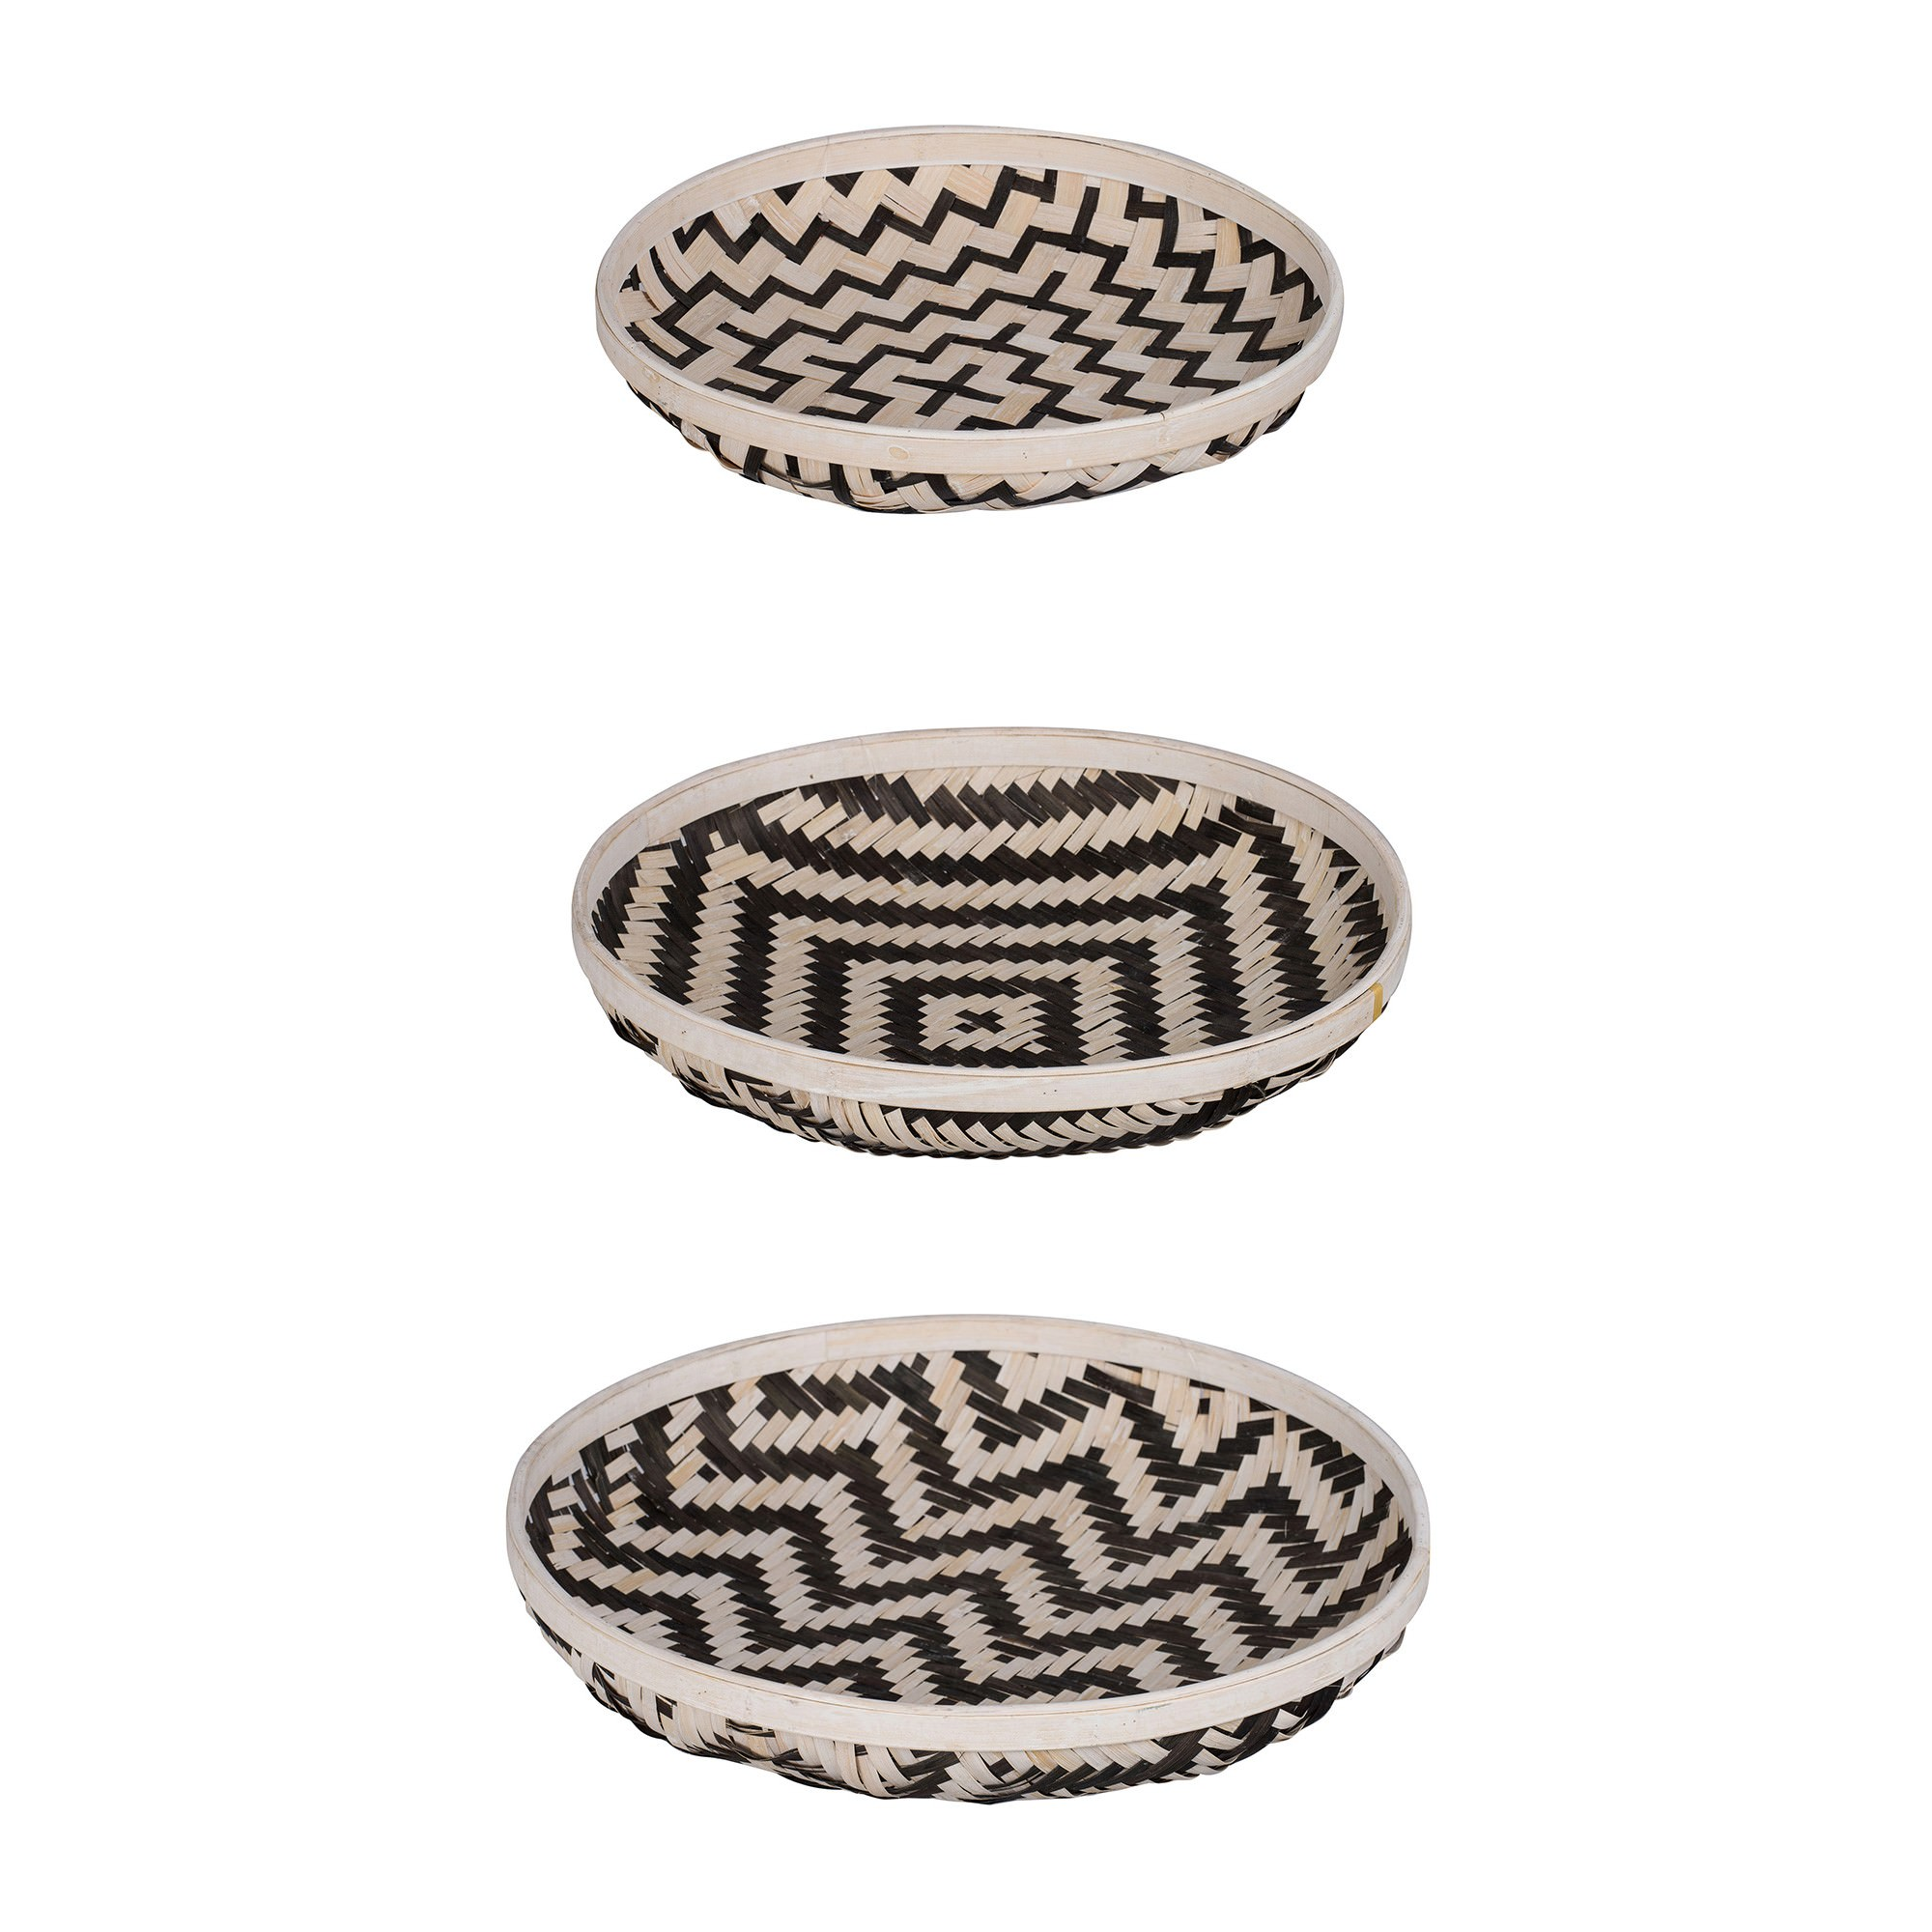 Organic Elements 3 Piece Woven Basket Tray Set, Round